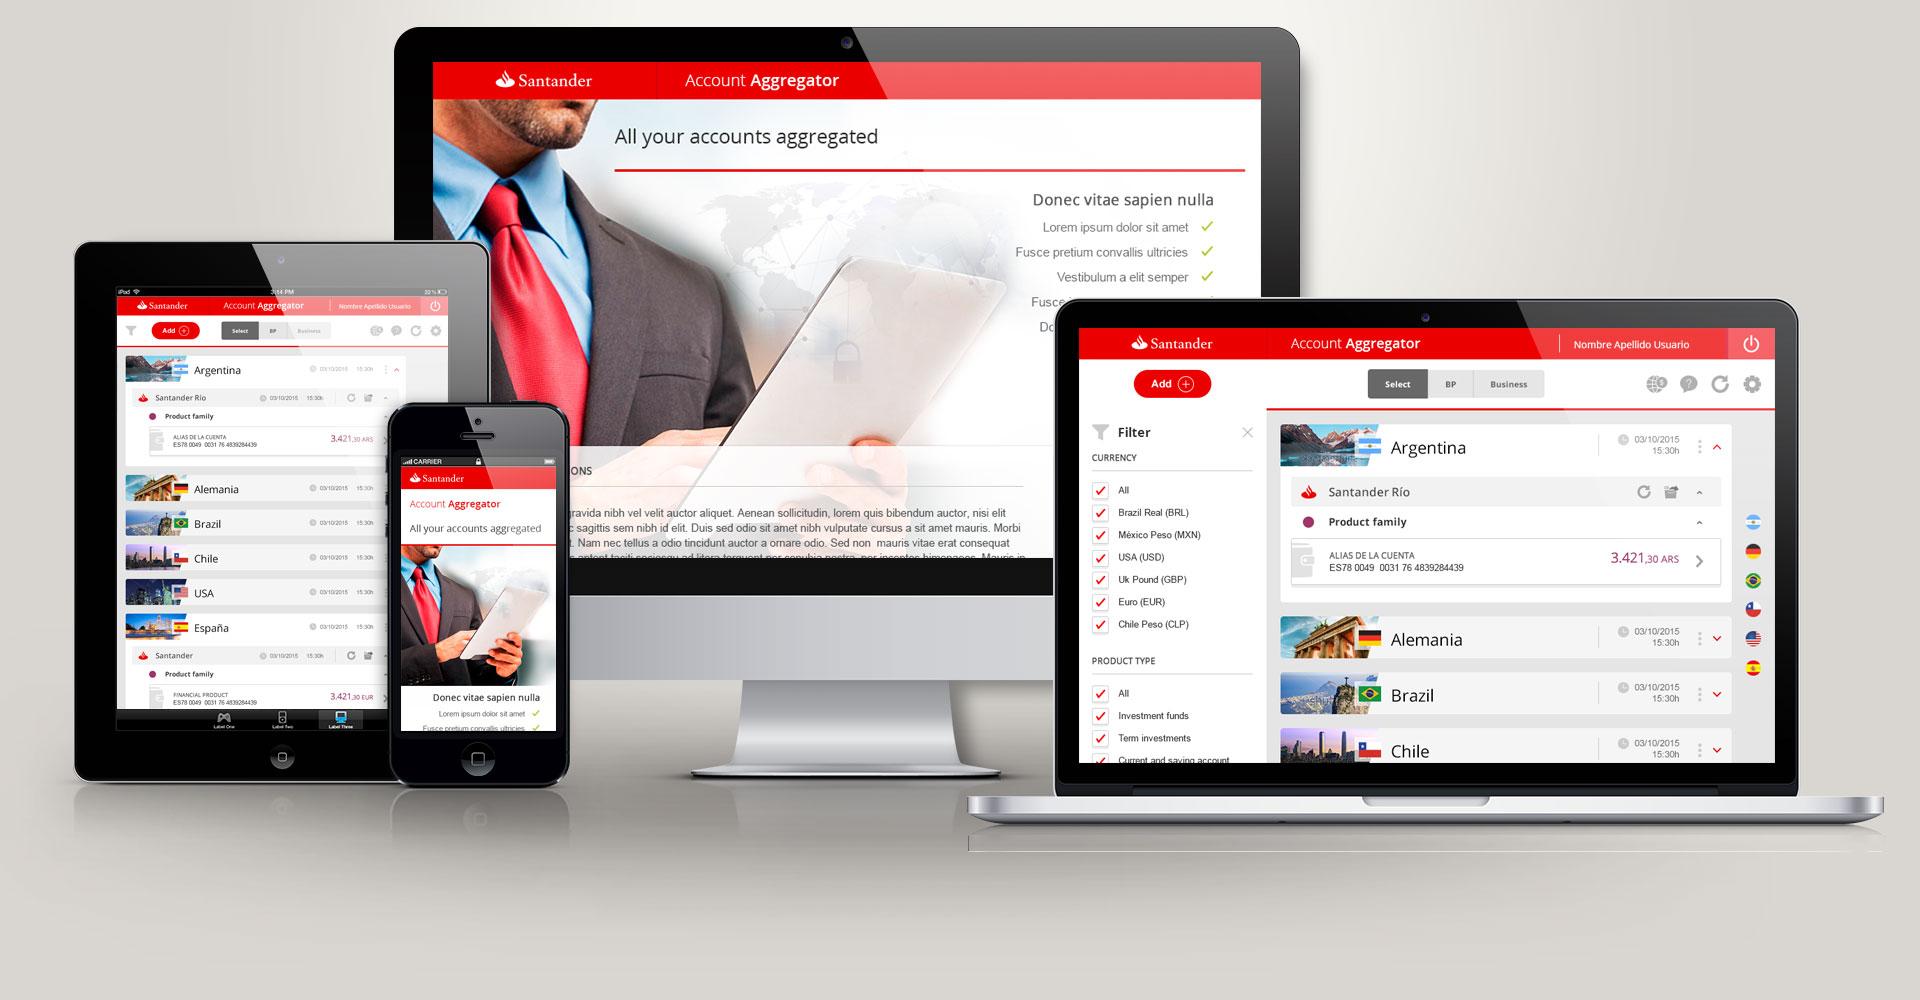 Santander - Account Aggregator